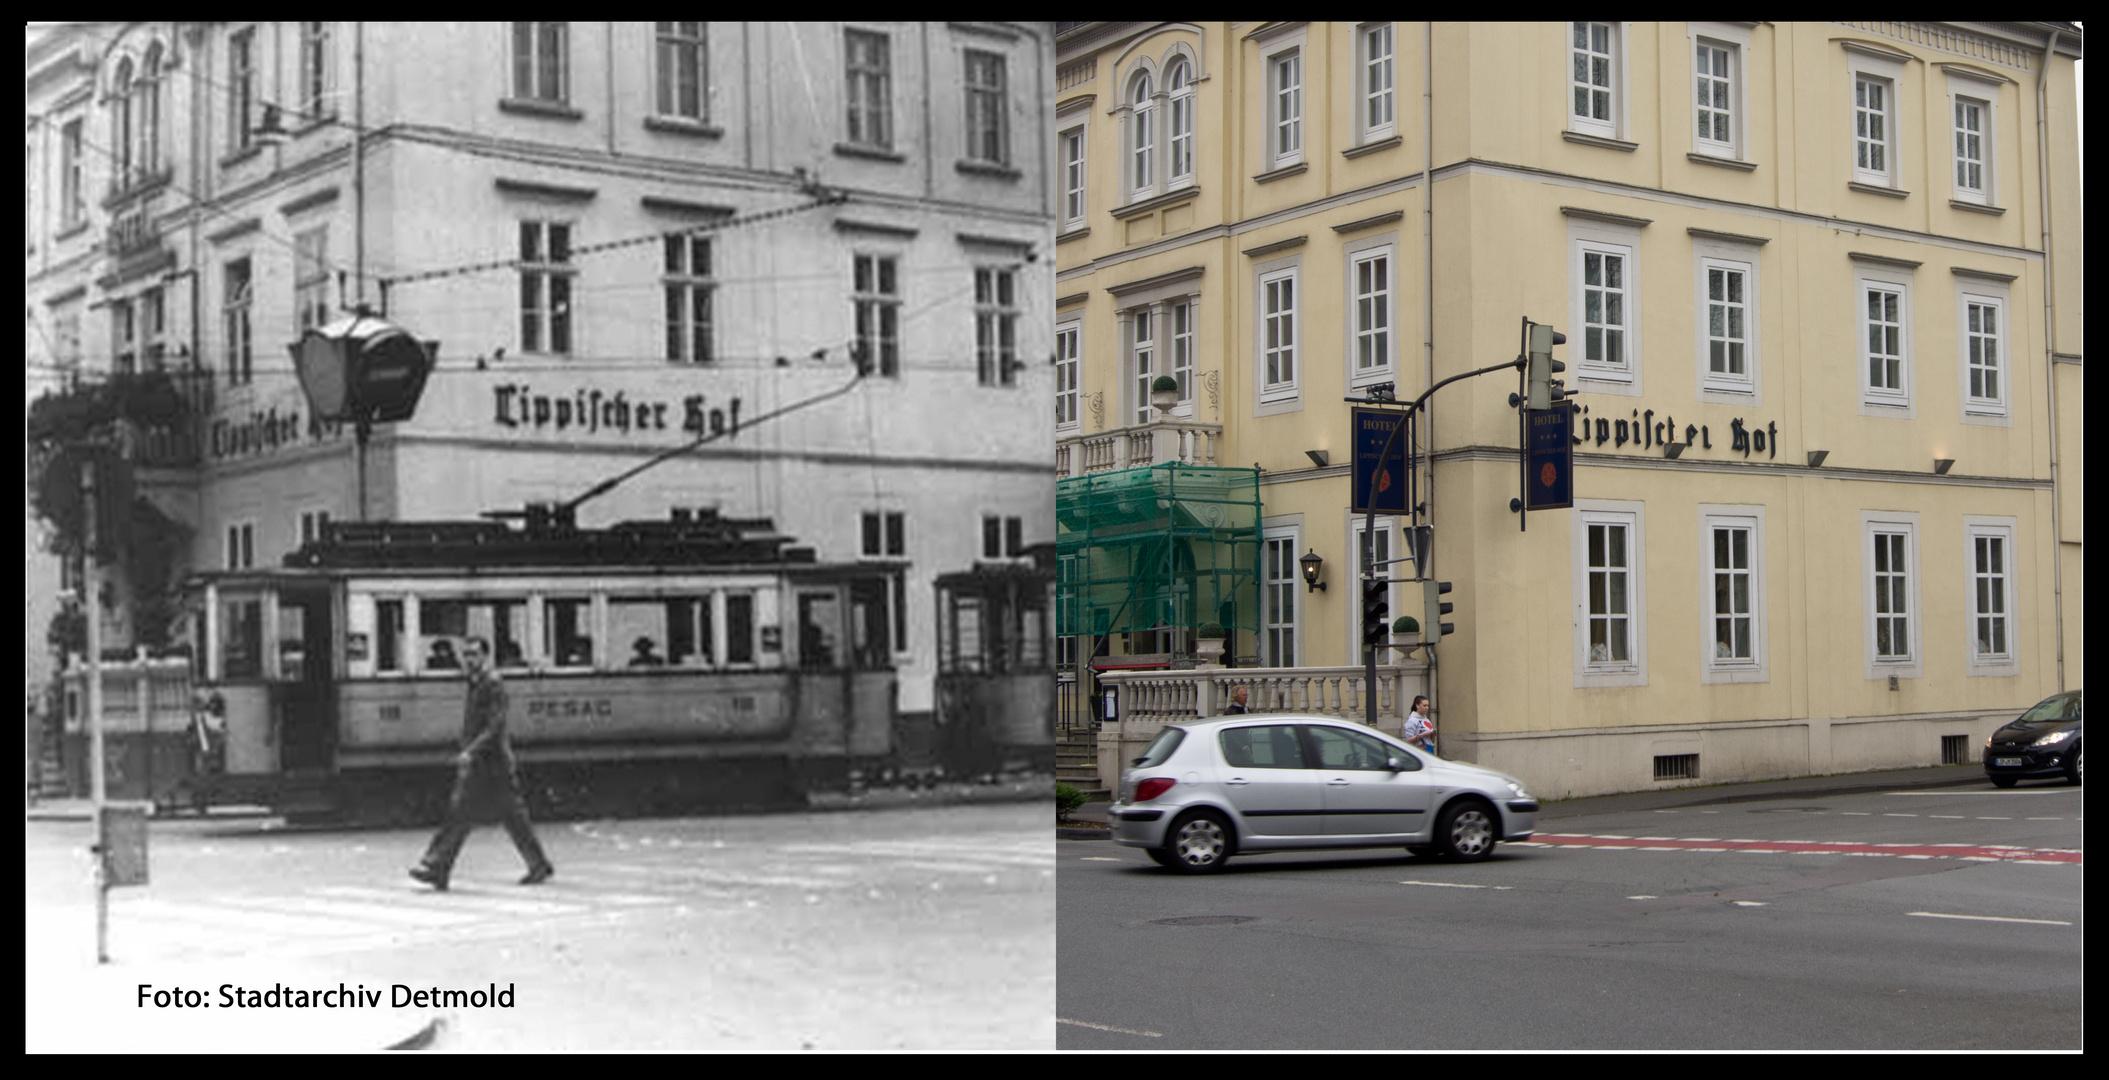 Detmold History 24/ Lippischer Hof